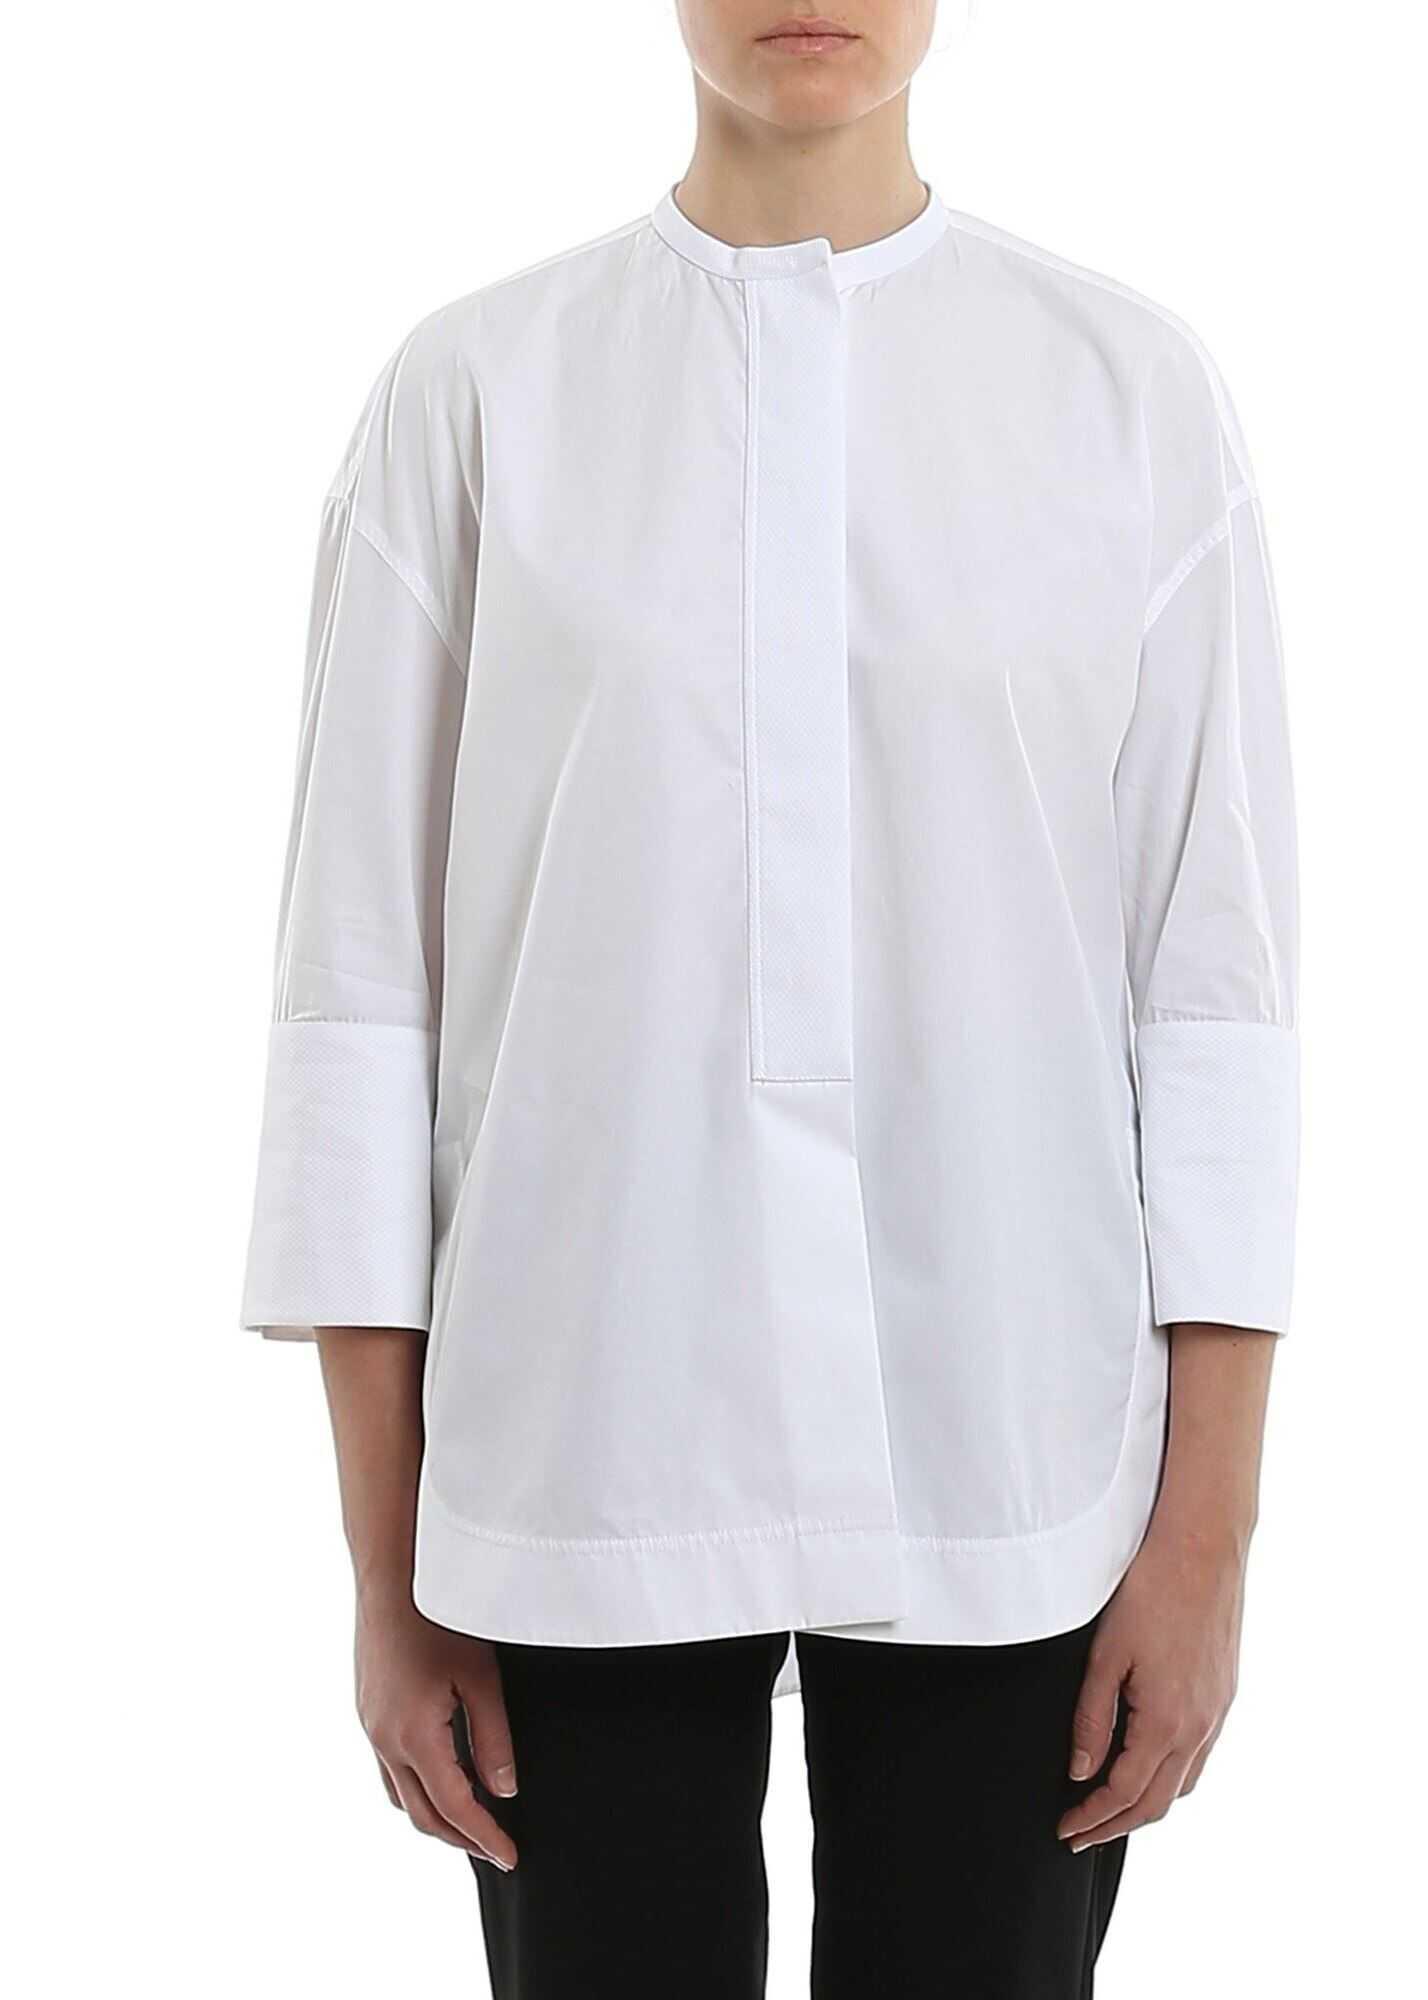 Giorgio Armani Poplin Shirt White